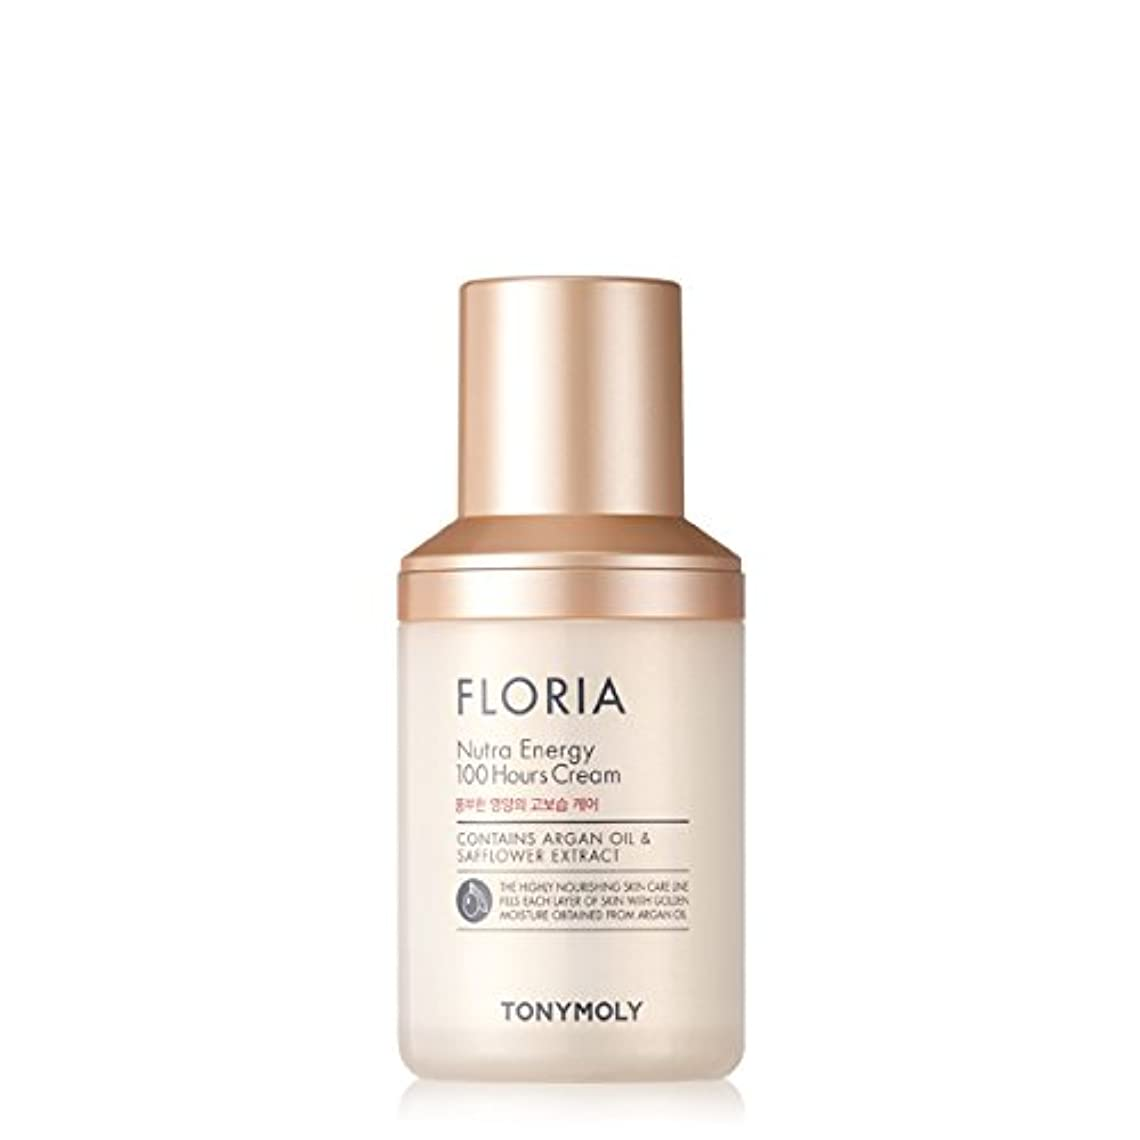 [NEW] TONY MOLY Floria Nutra energy 100 hours Cream 50ml トニーモリー フローリア ニュートラ エナジー 100時間 クリーム 50ml [並行輸入品]